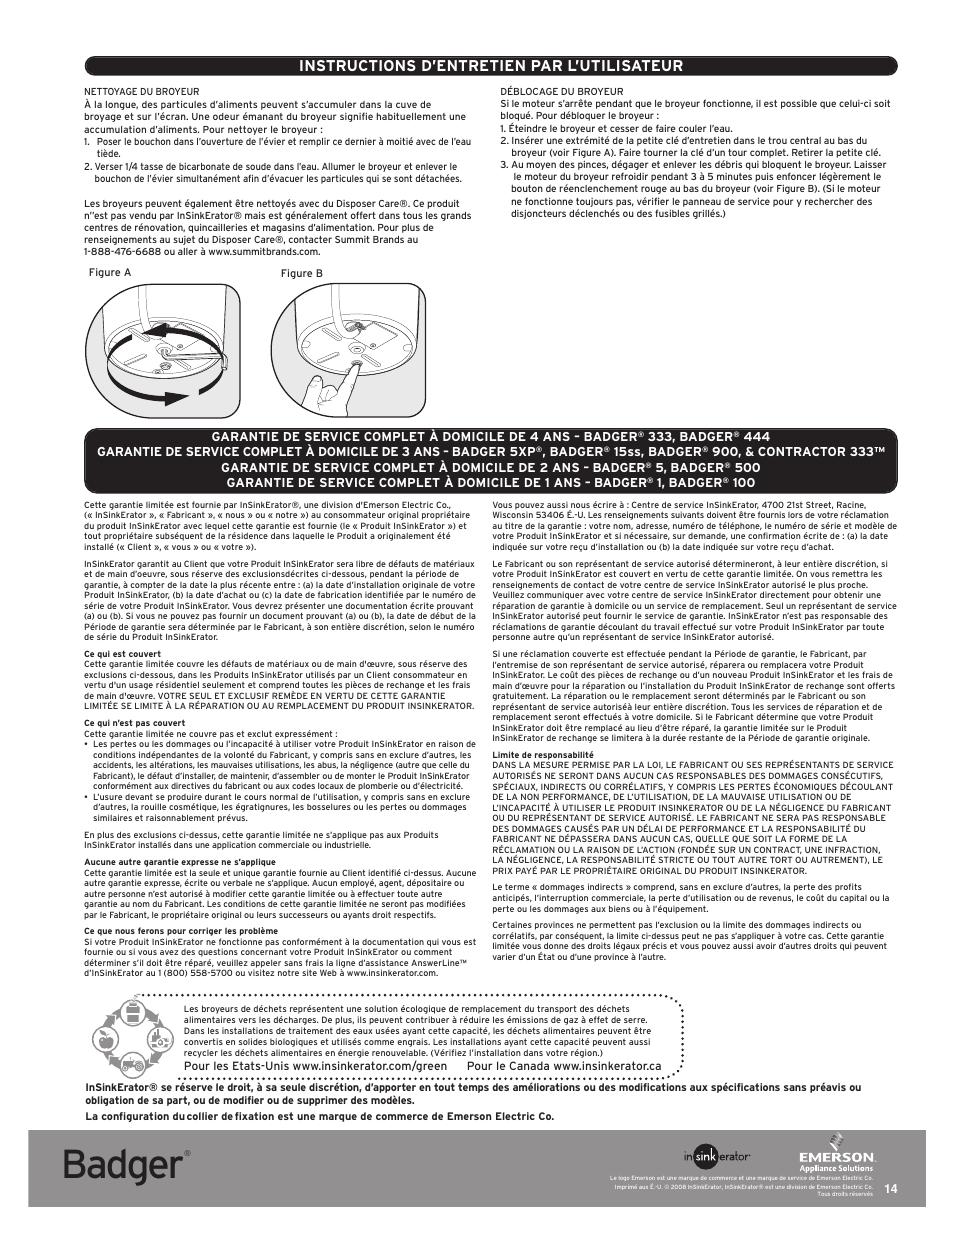 Insinkerator Badger 500 Manual : insinkerator, badger, manual, Badger,, Instructions, D'entretien, L'utilisateur, InSinkErator, Badger, Manual, Original